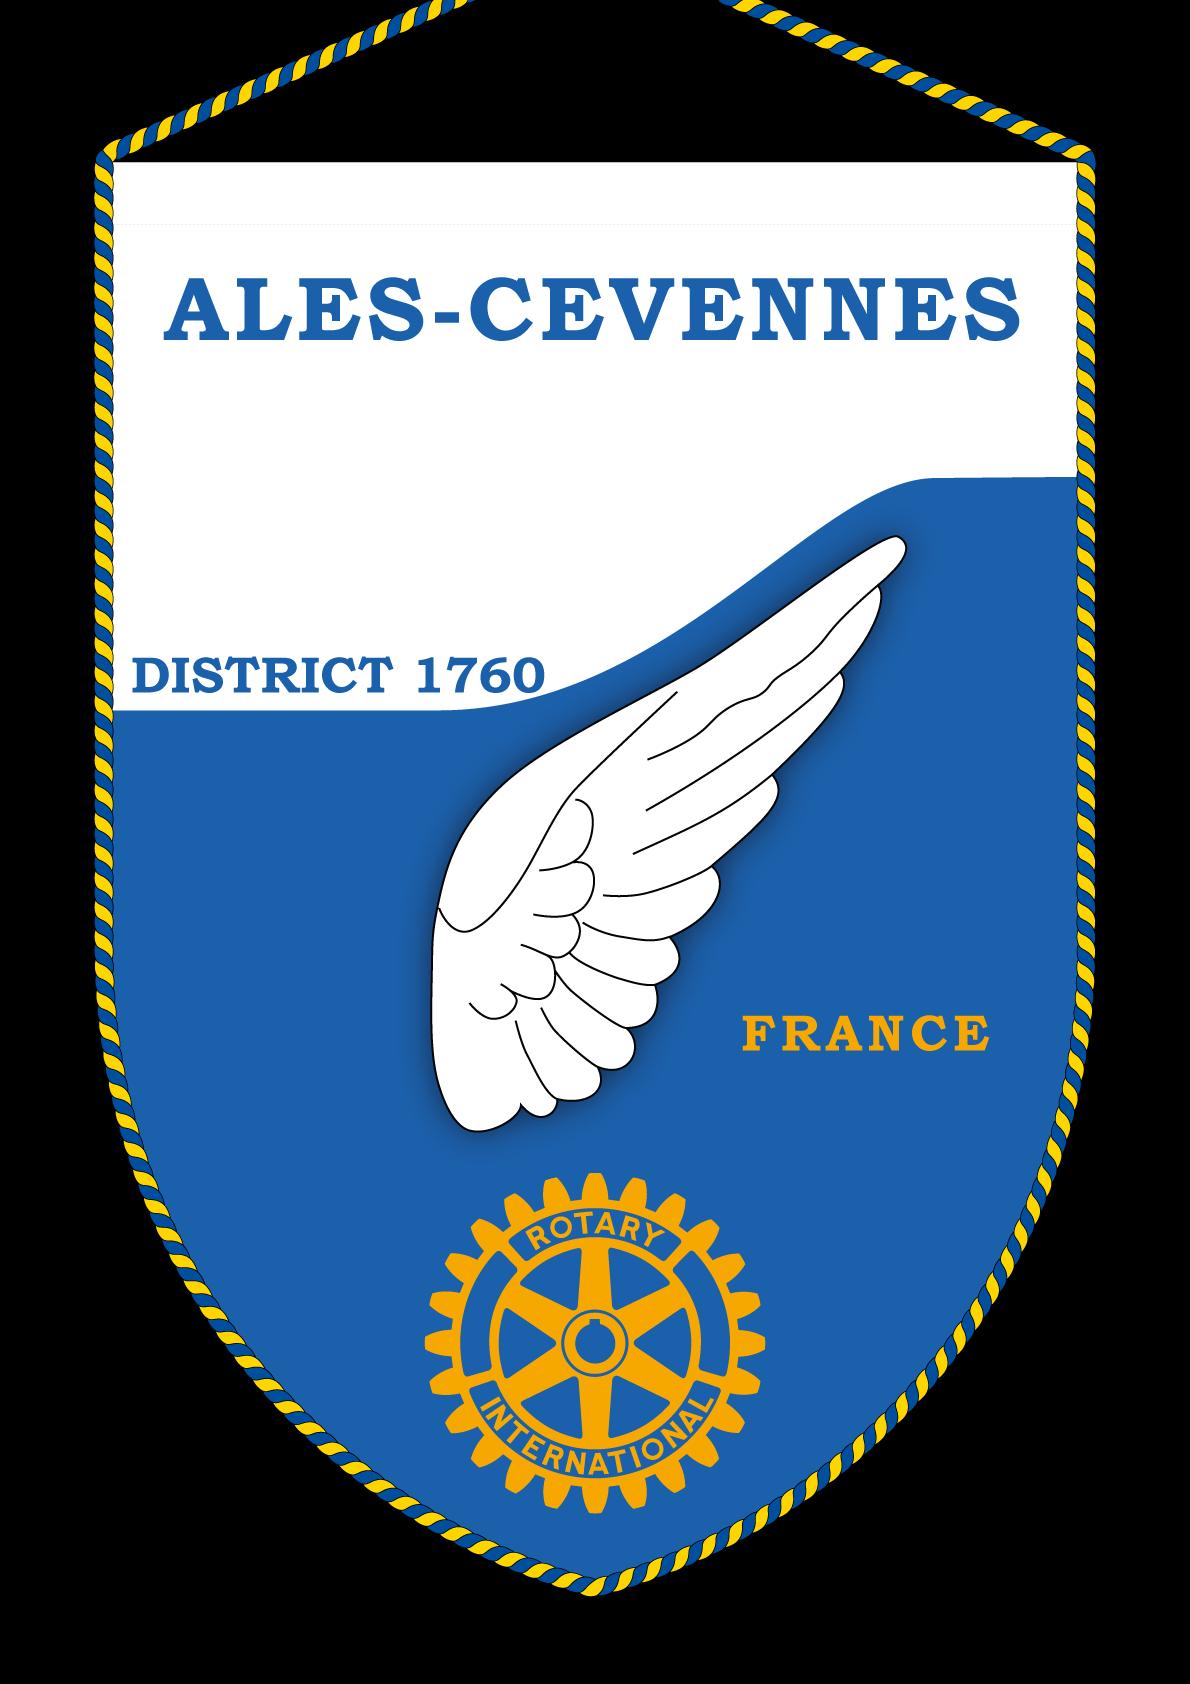 FANION ROTARY CLUB ALES CEVENNES